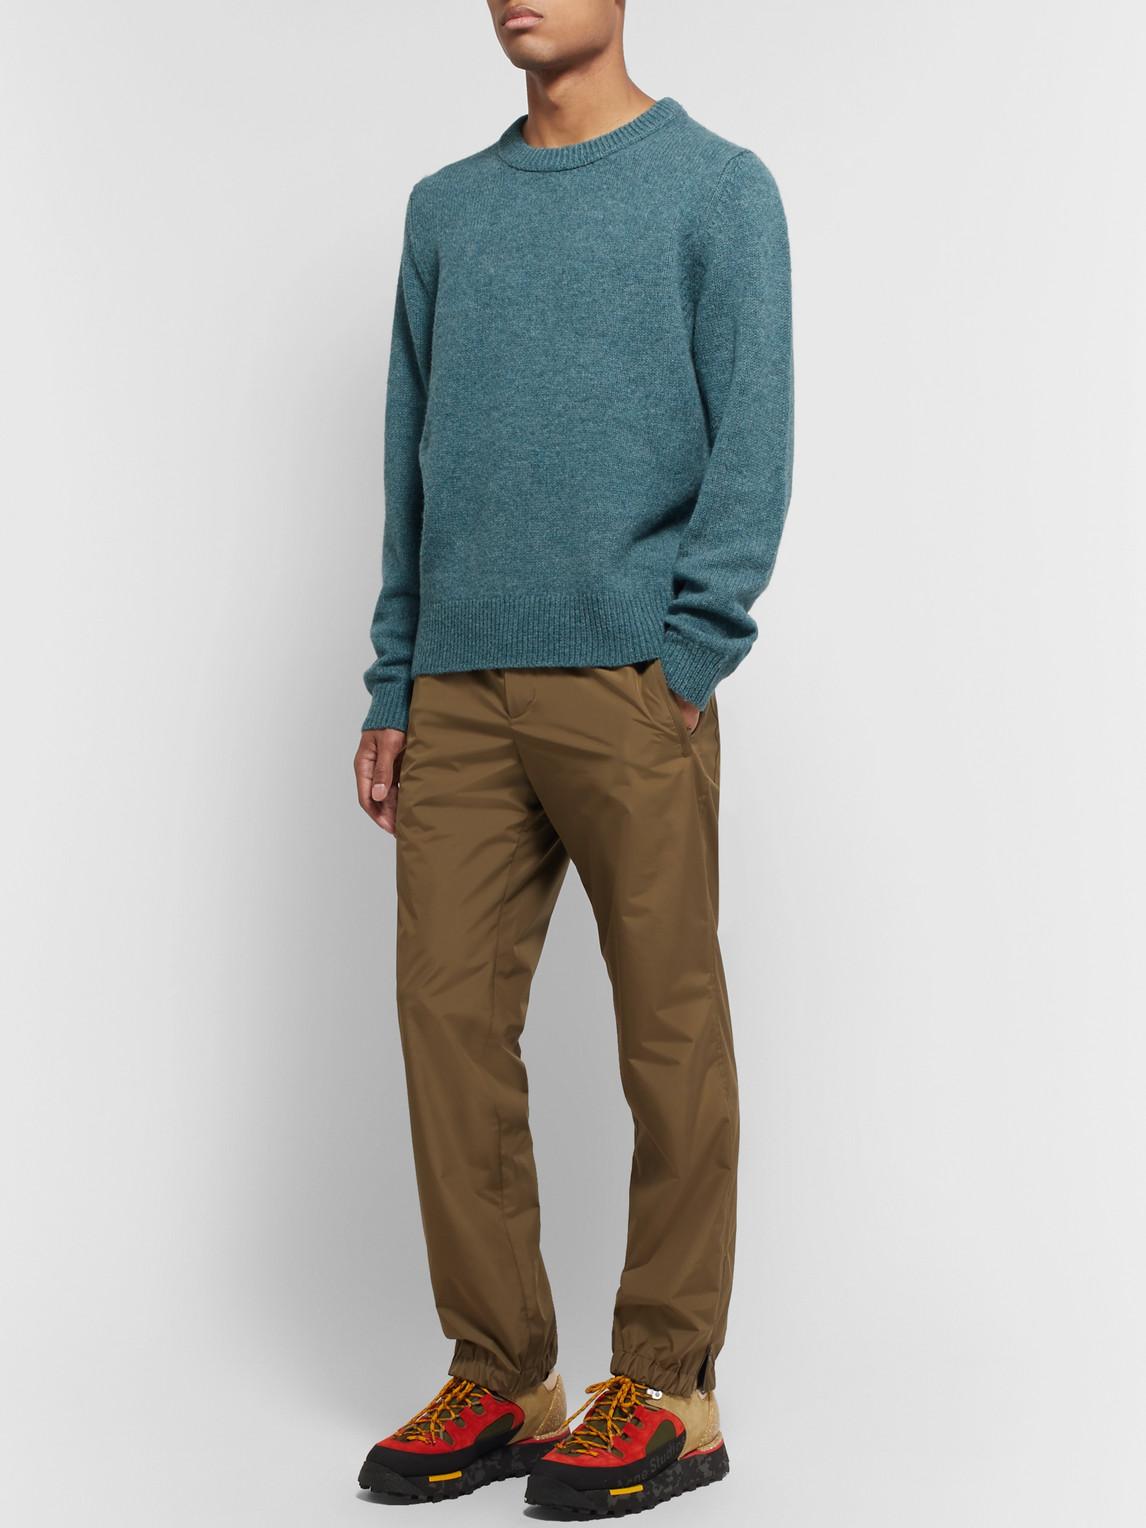 Acne Studios Sweaters KAI MÉLANGE WOOL SWEATER